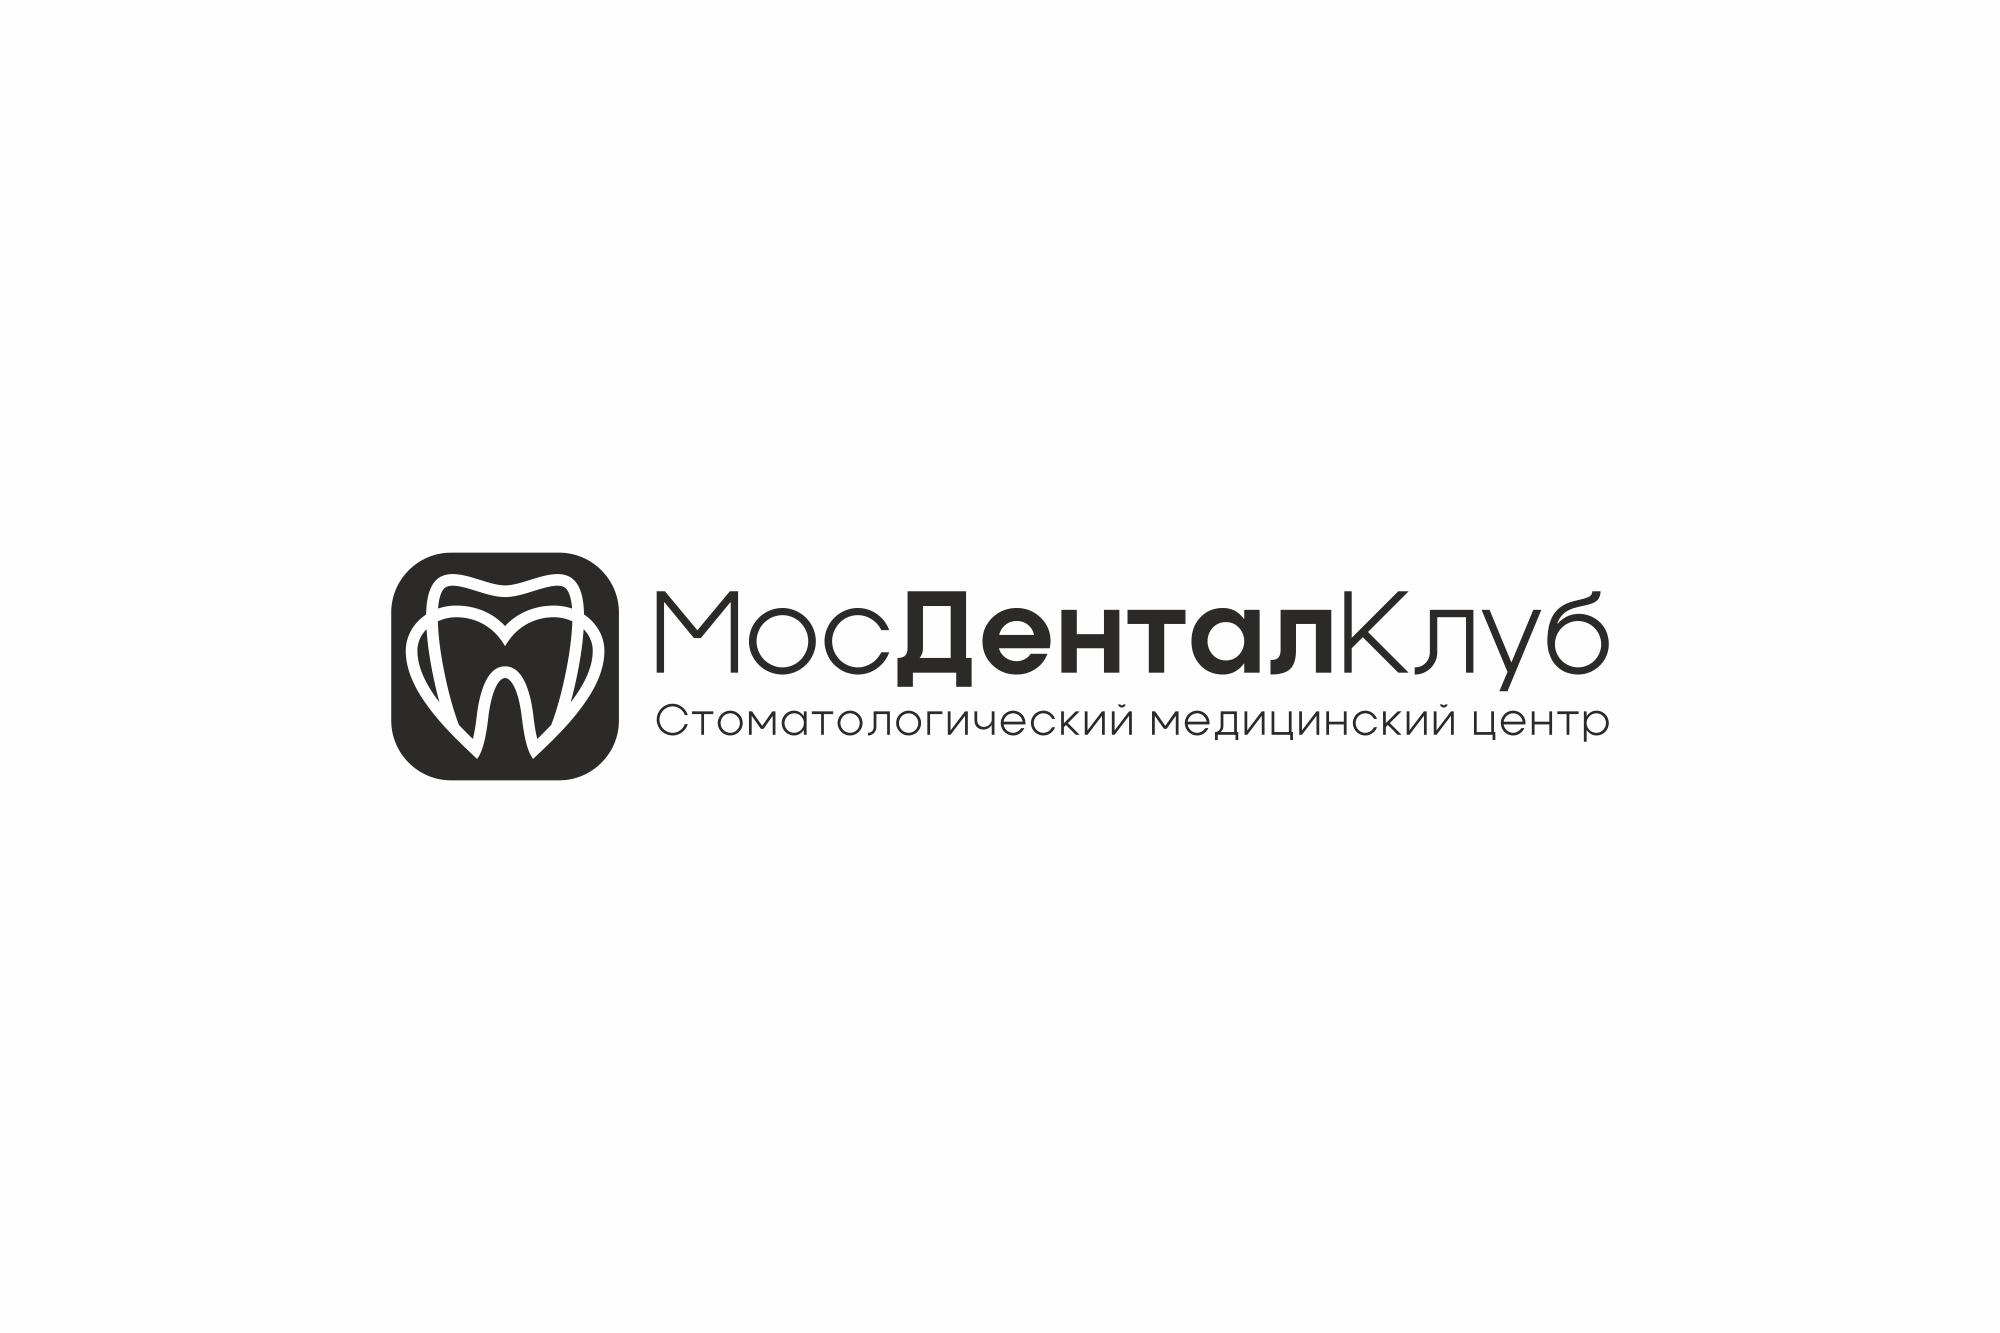 Разработка логотипа стоматологического медицинского центра фото f_9665e4eb2de9ed5f.jpg